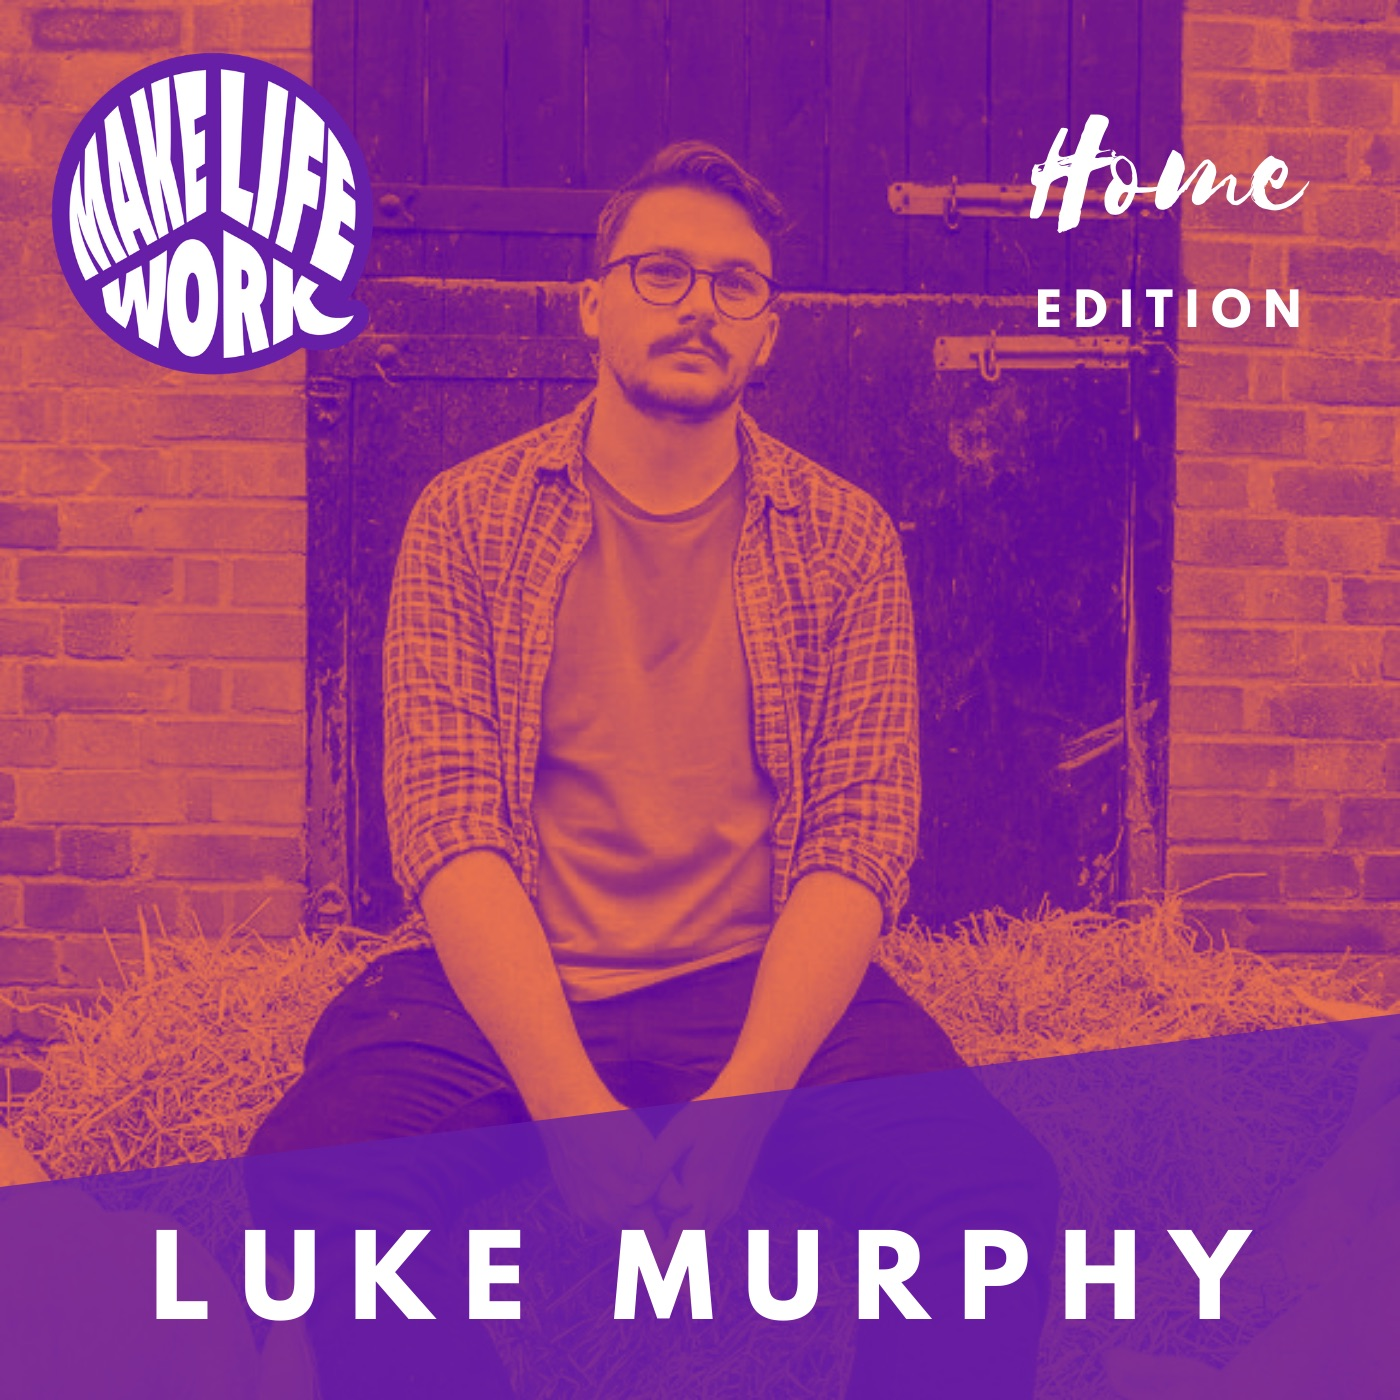 Make Life Work 11 - Luke Murphy